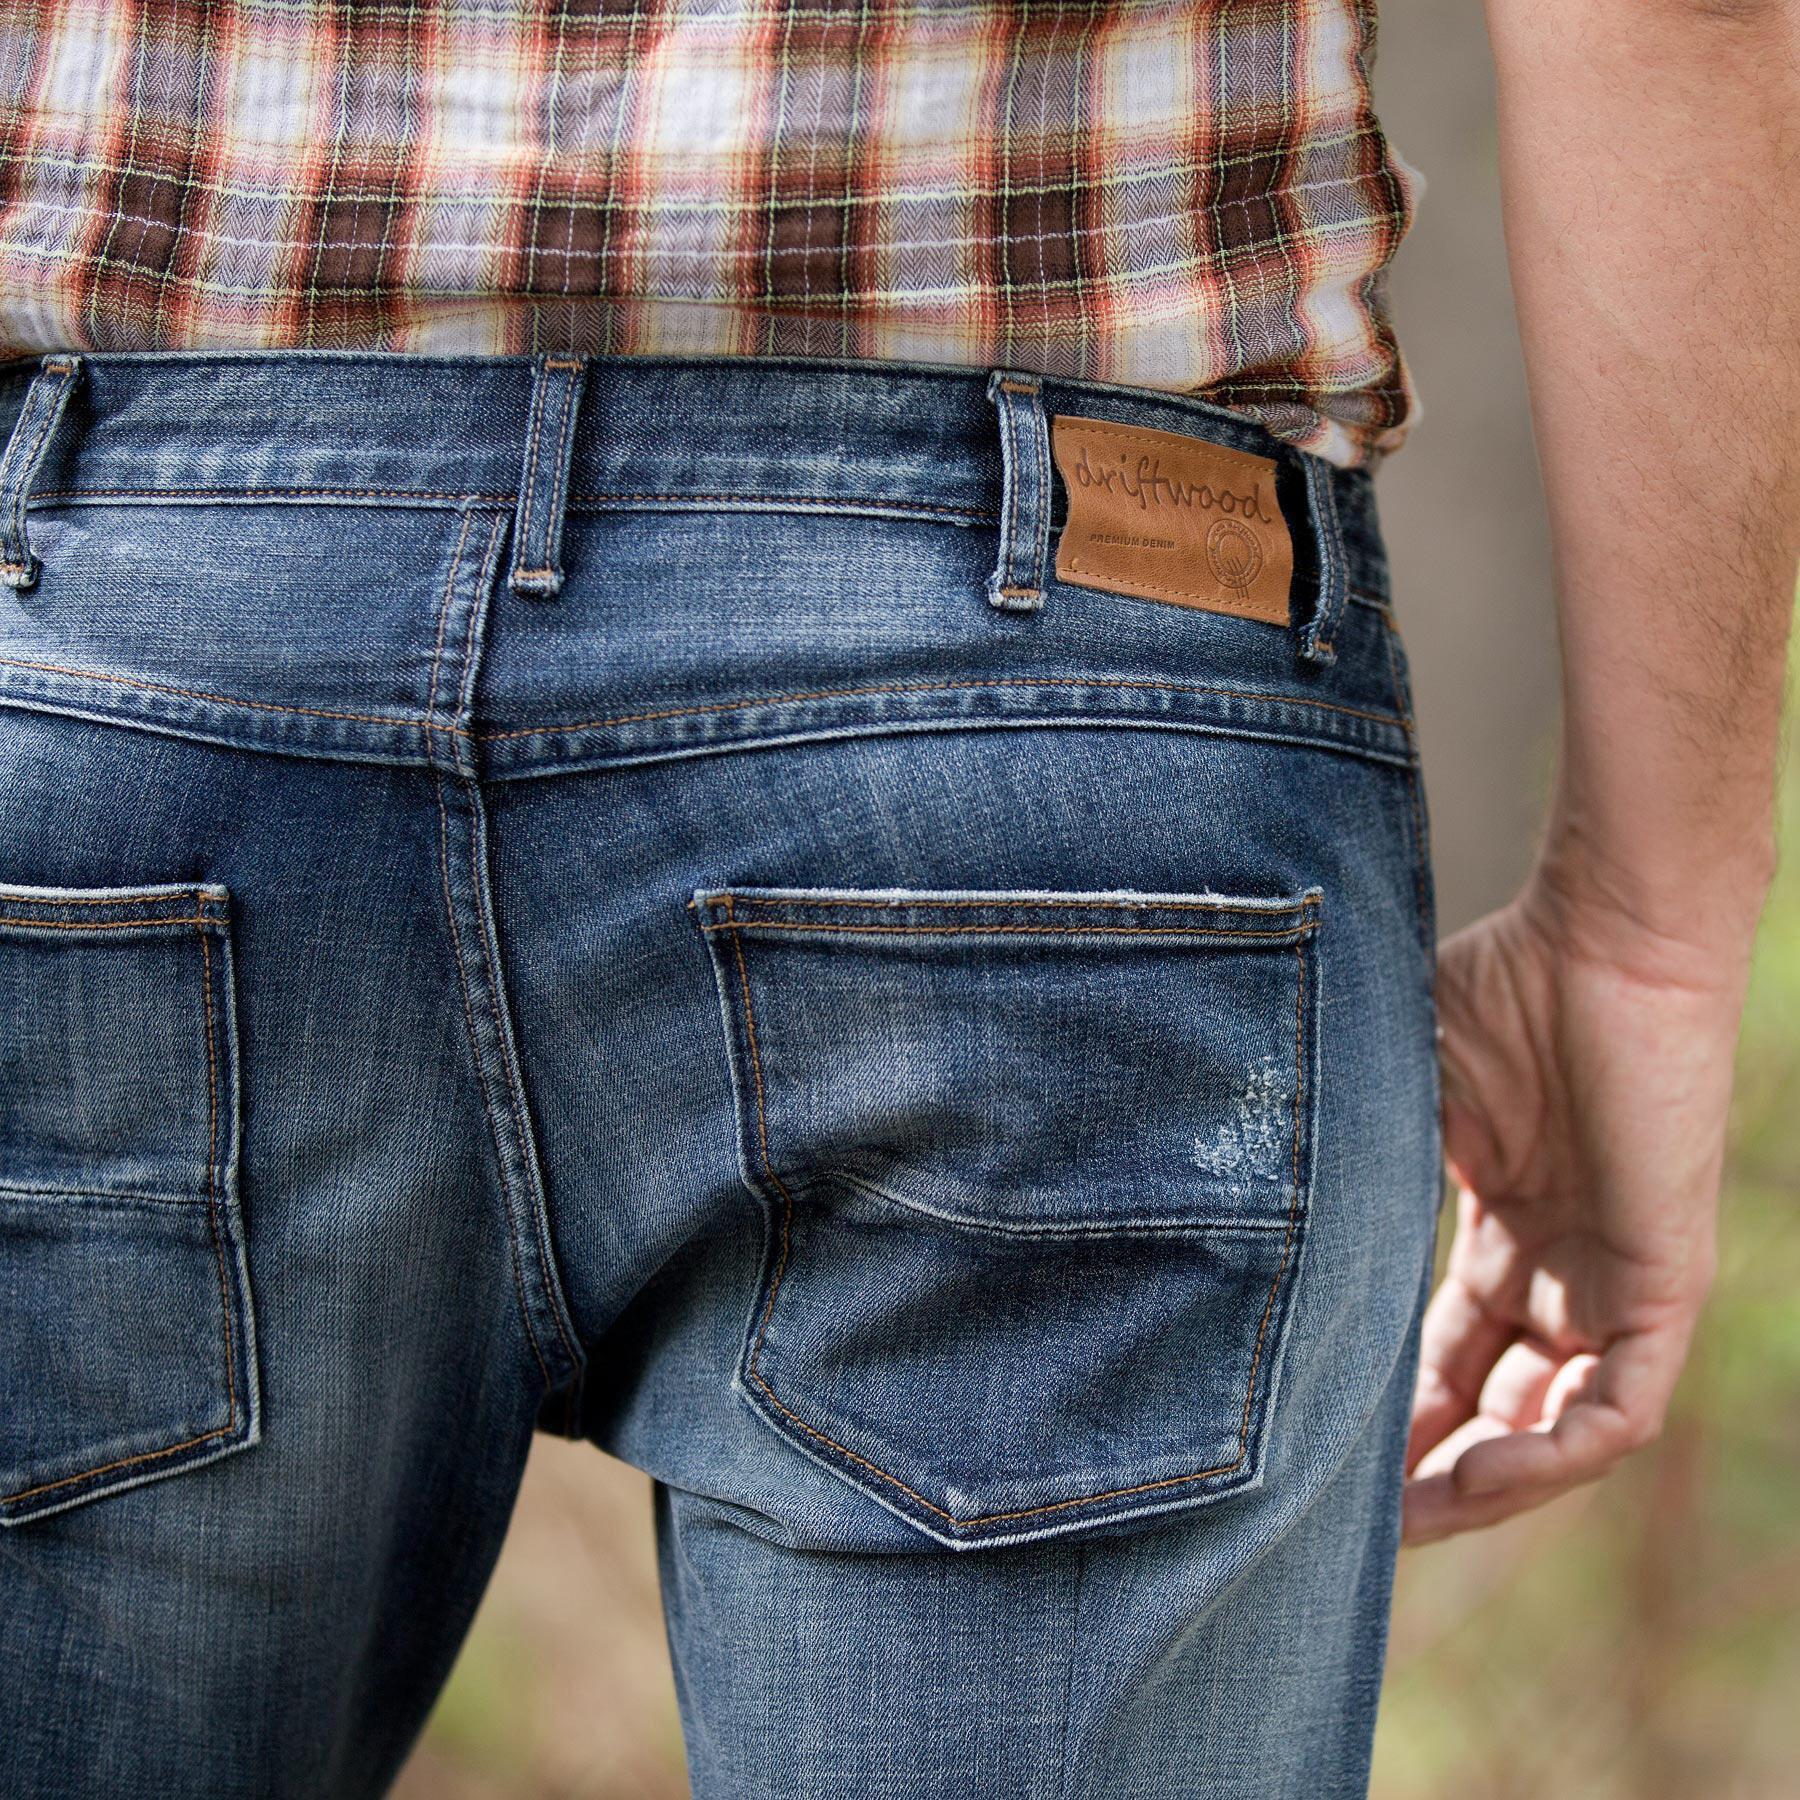 Crusader Jeans: View 3